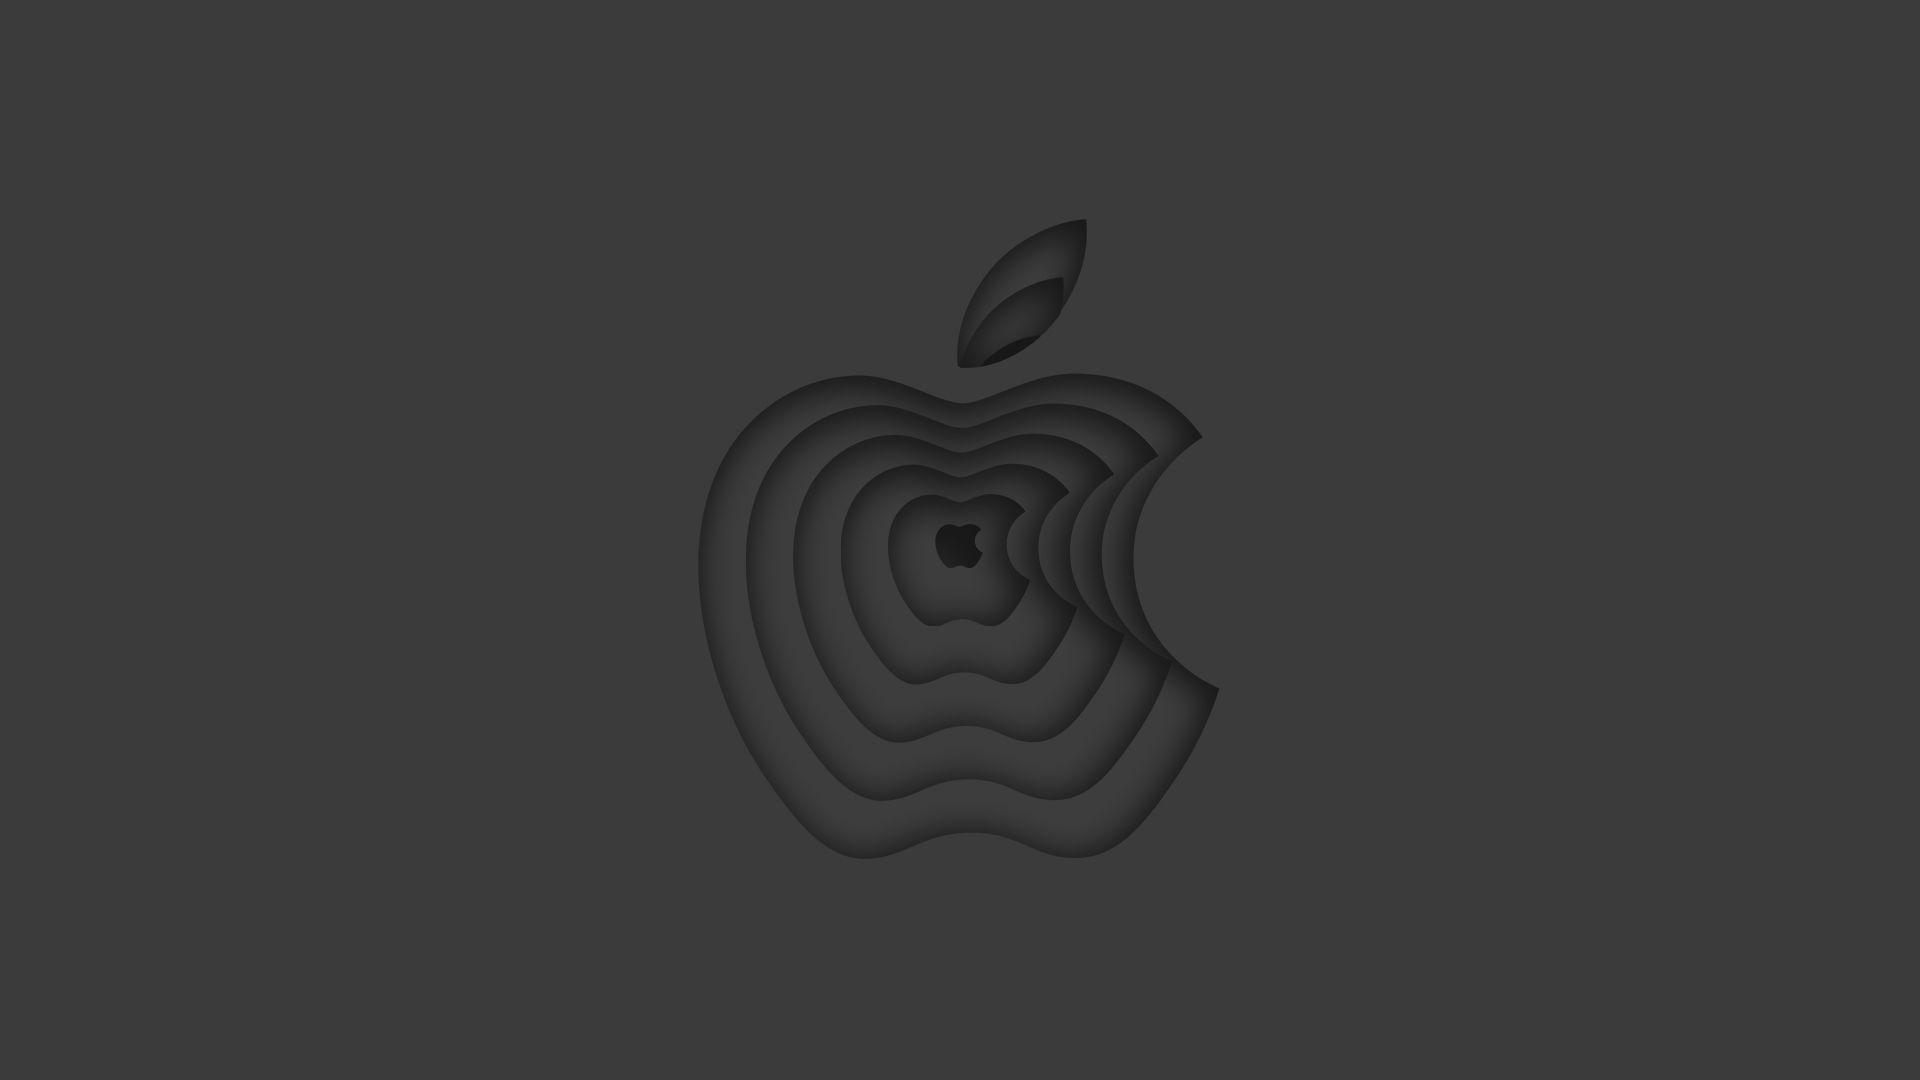 Illustration of a receding Apple logo